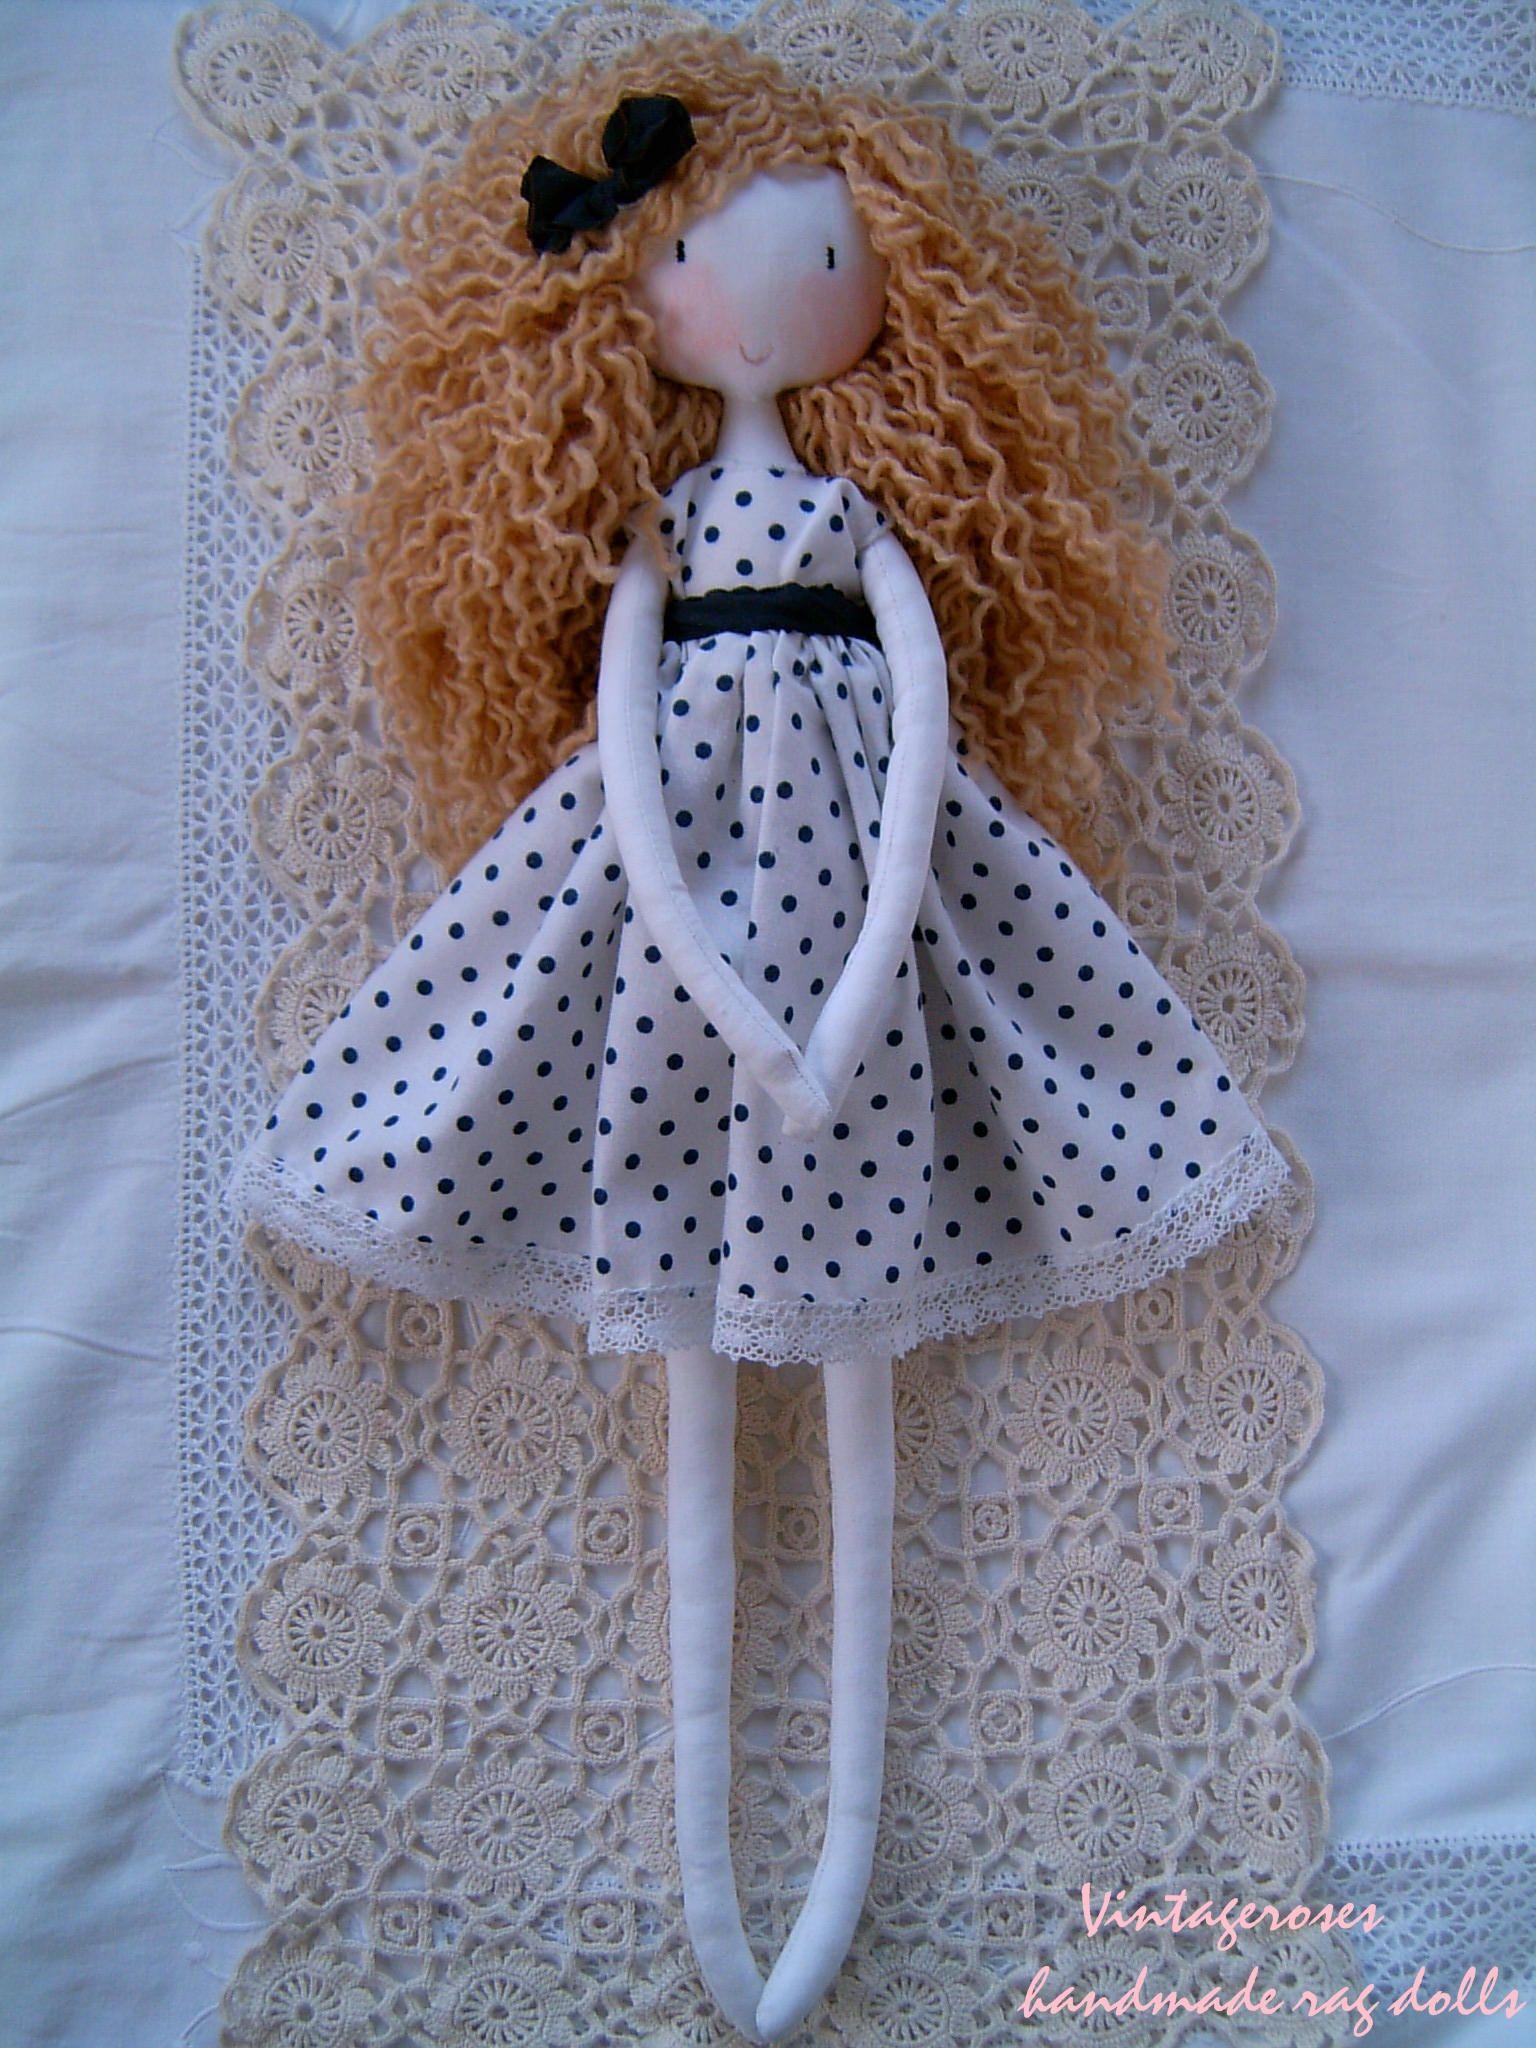 Handmade rag doll #dollies